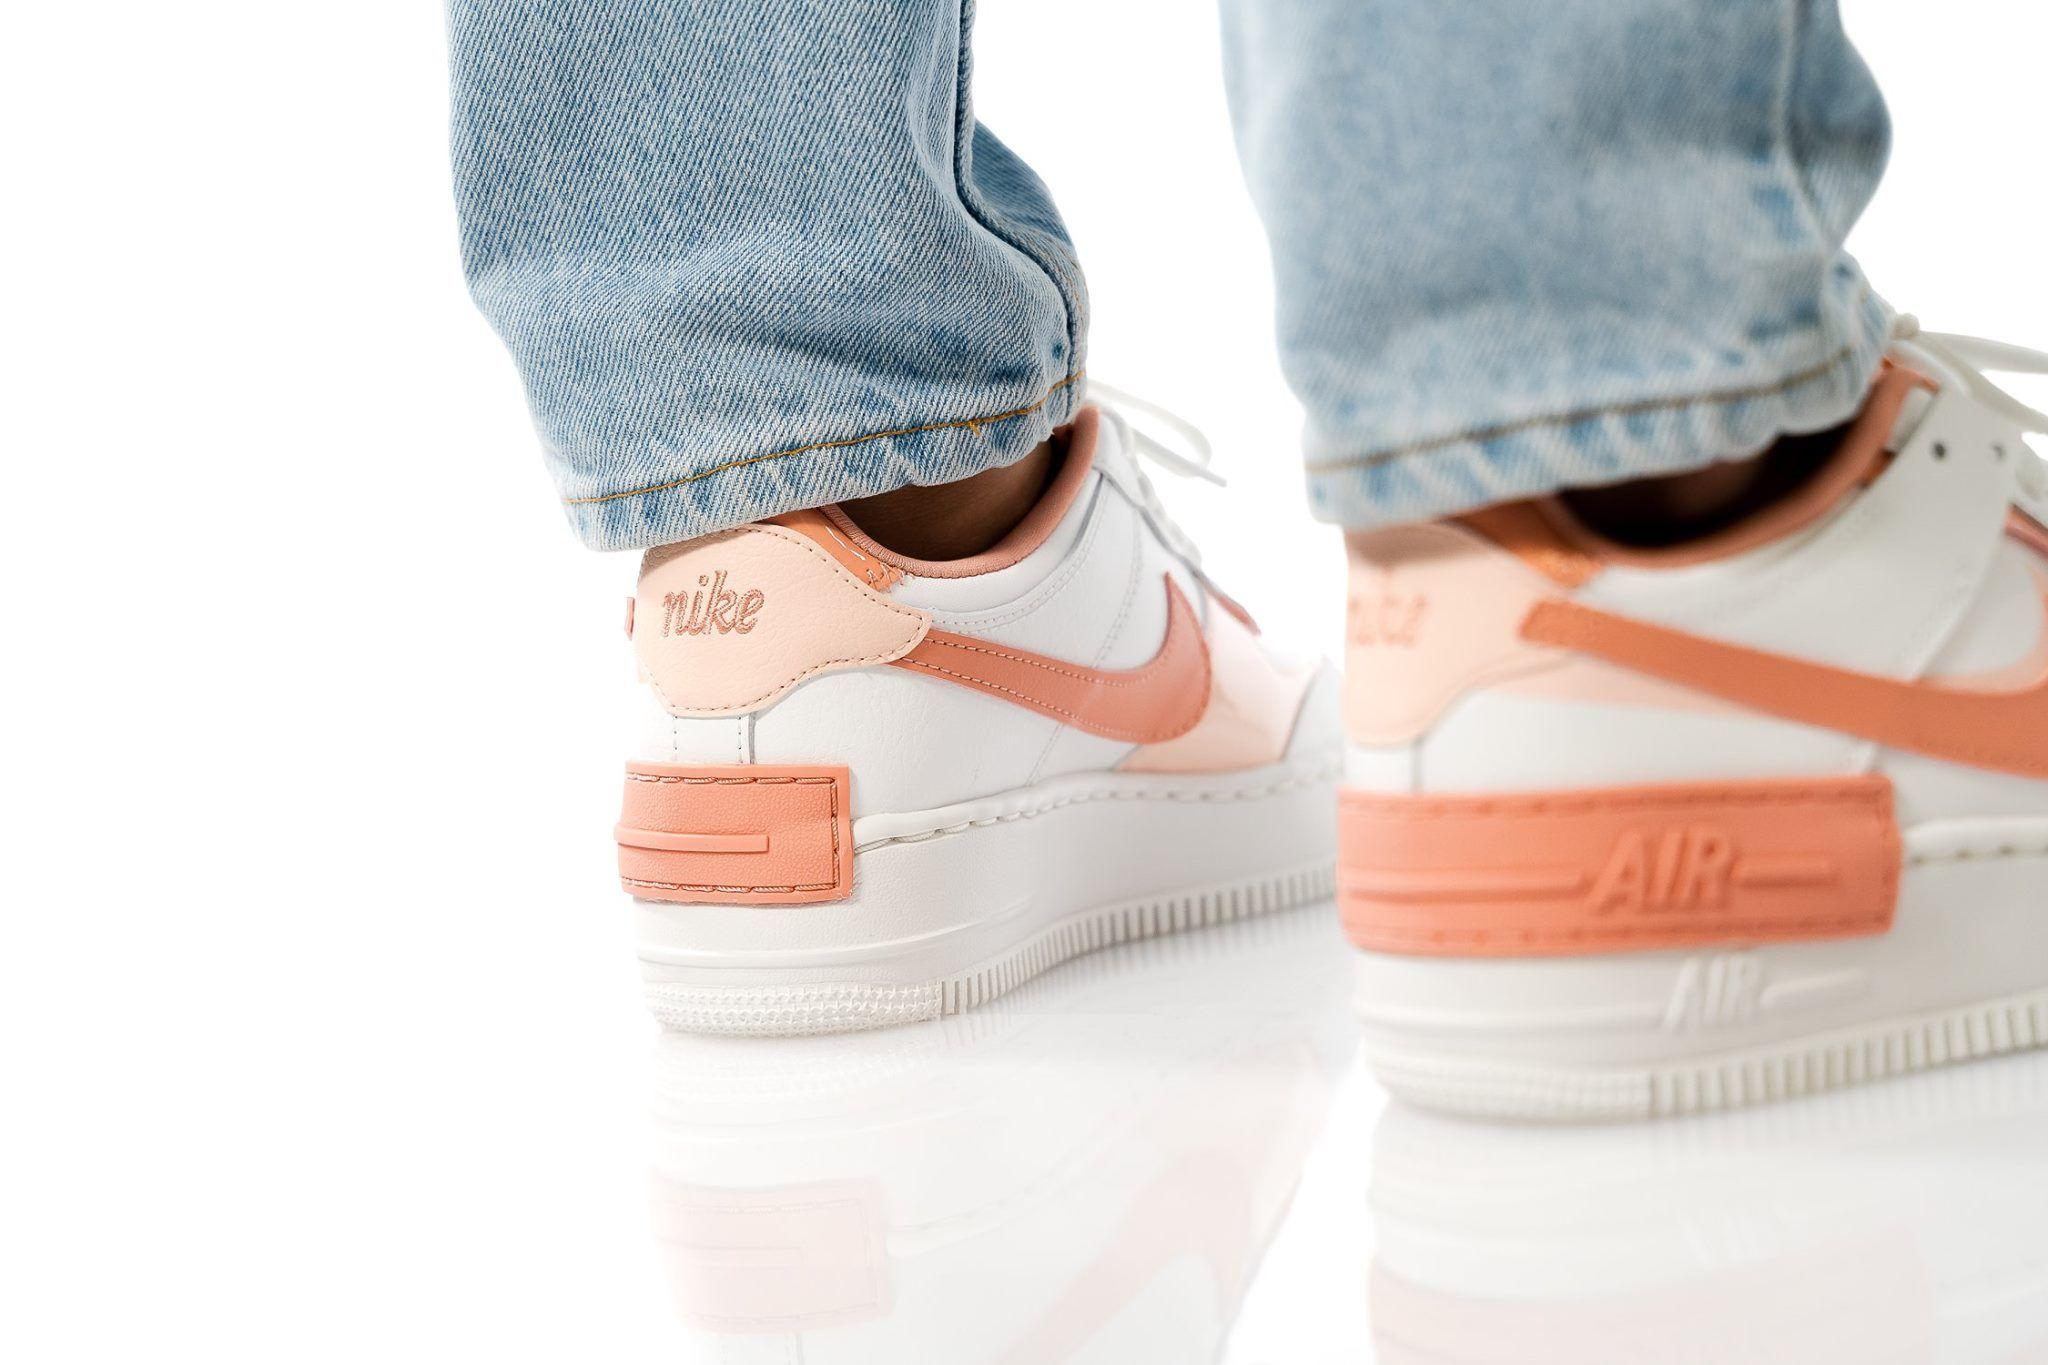 Pin auf Sneakers Damen #sneaker #schuhe #frauen